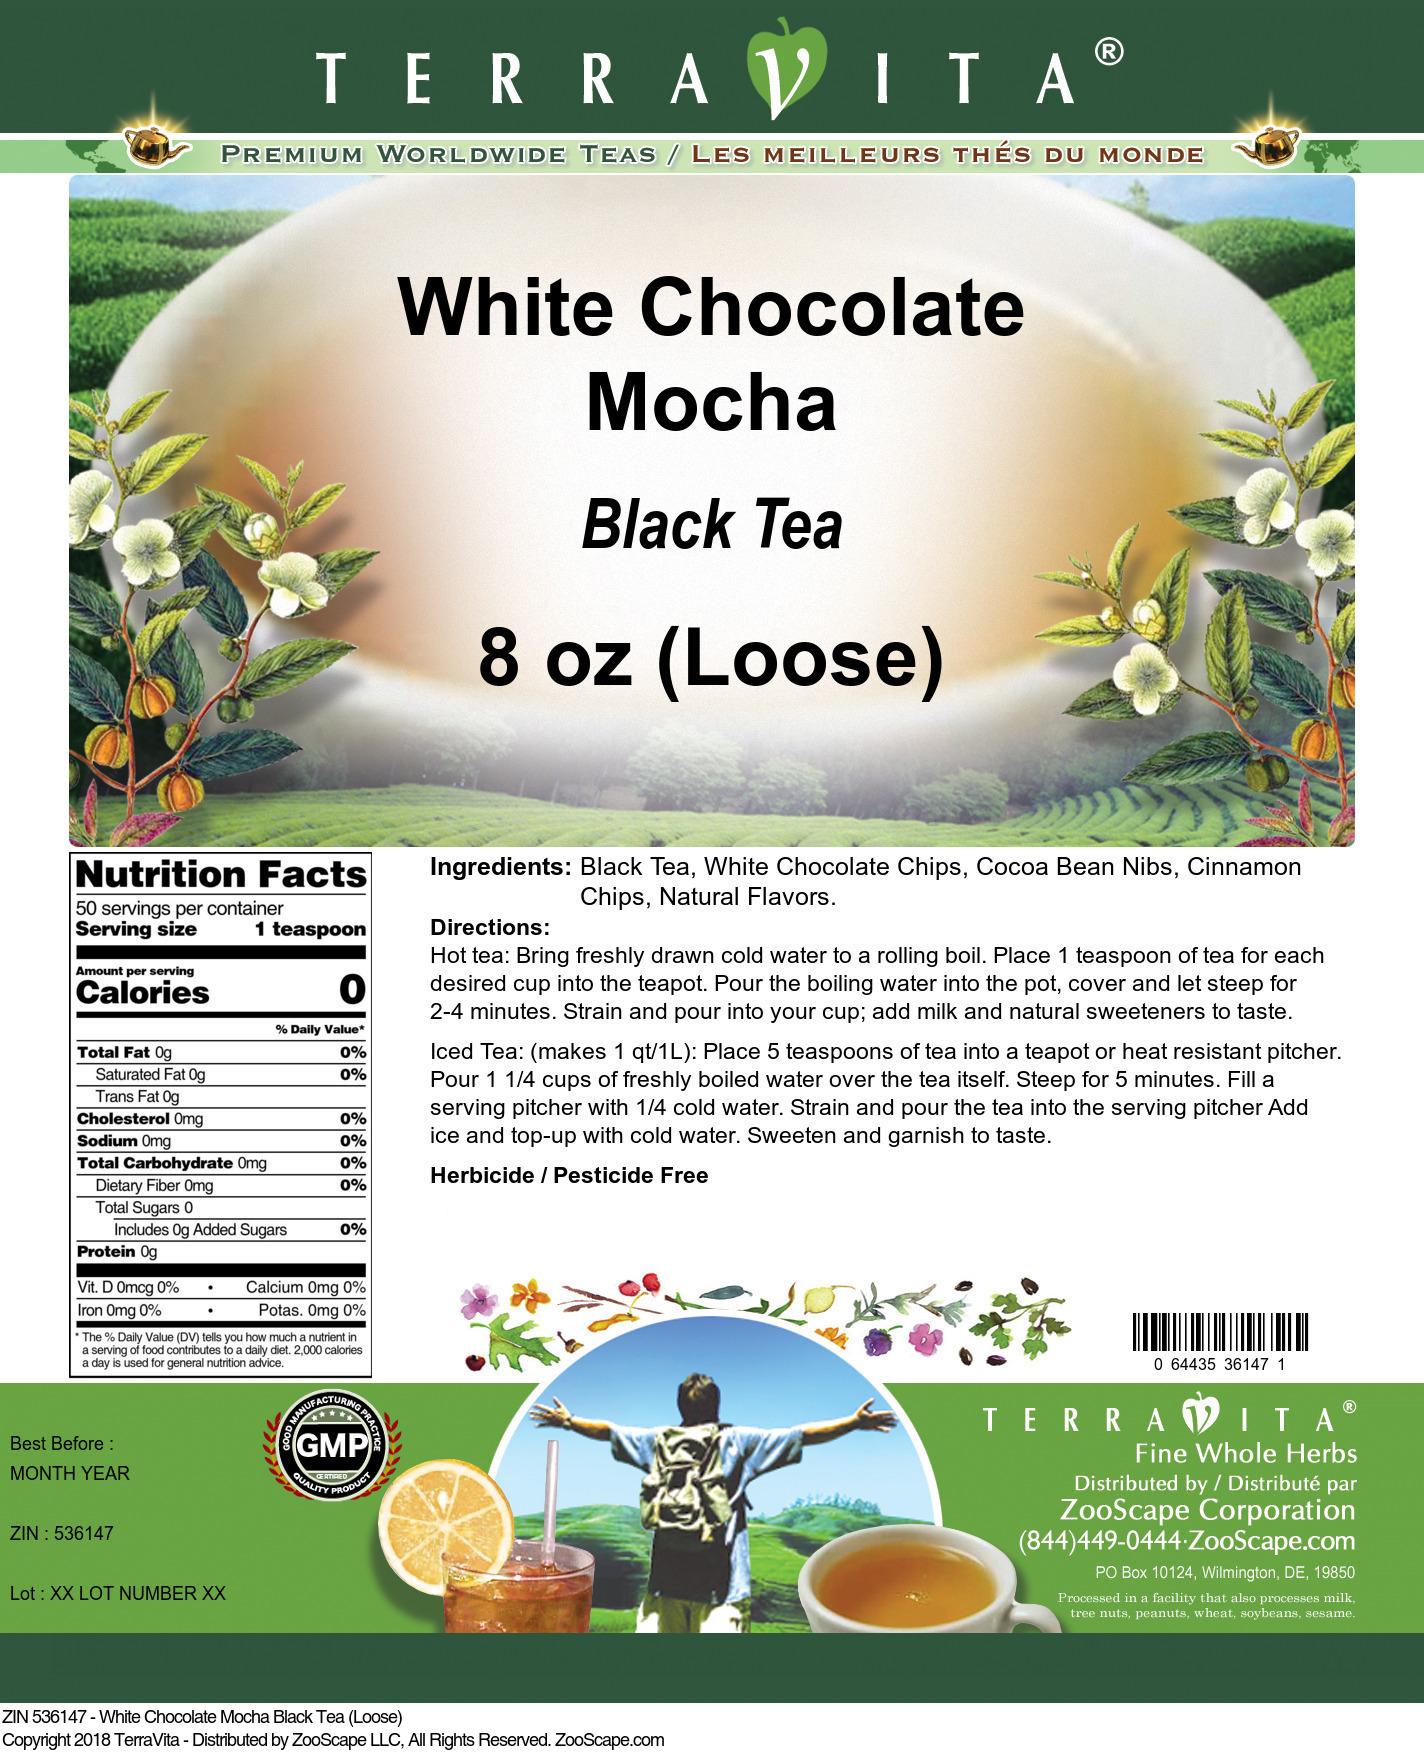 White Chocolate Mocha Black Tea